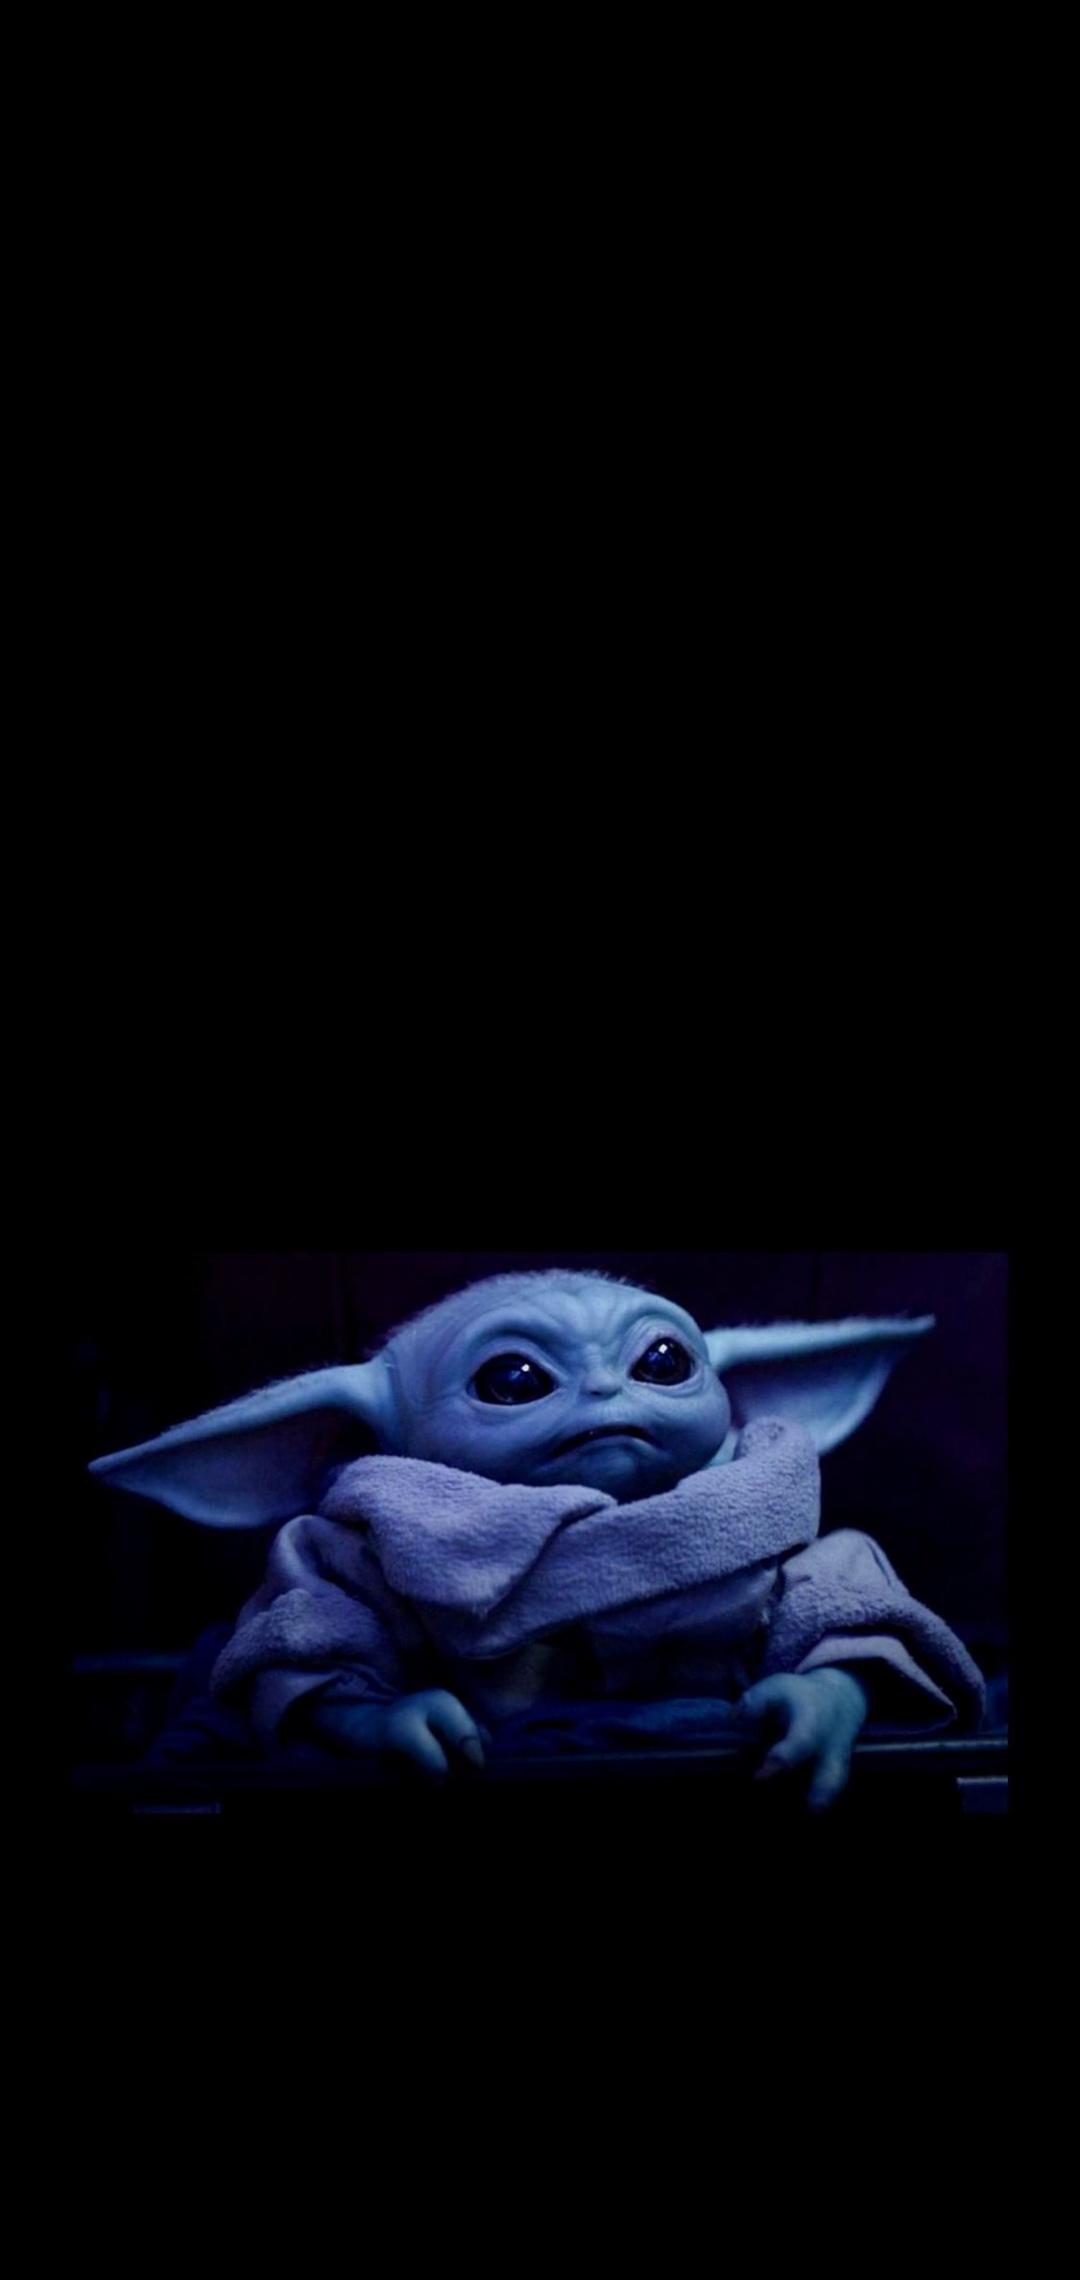 Baby Yoda Again Imgur Wallpaper For Samsung Galaxy Note10 5g